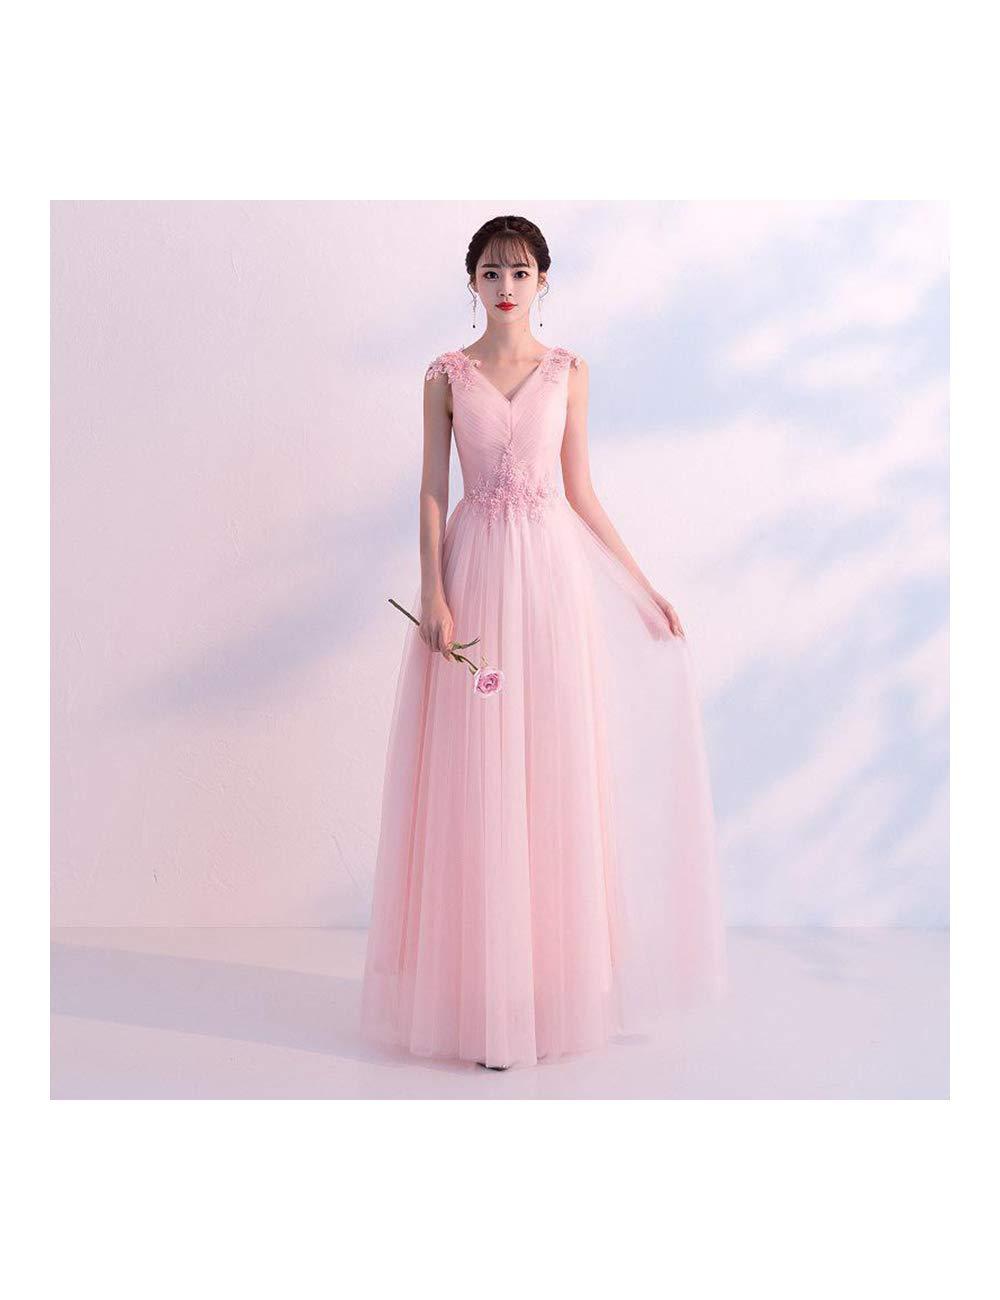 rose 1 XXXL ATLD Cheongsam Robe De Soirée De Mariage élégante Mariée Exquise Dentelle Fleur Strass Cheongsam Col en V sans Manches Qipao